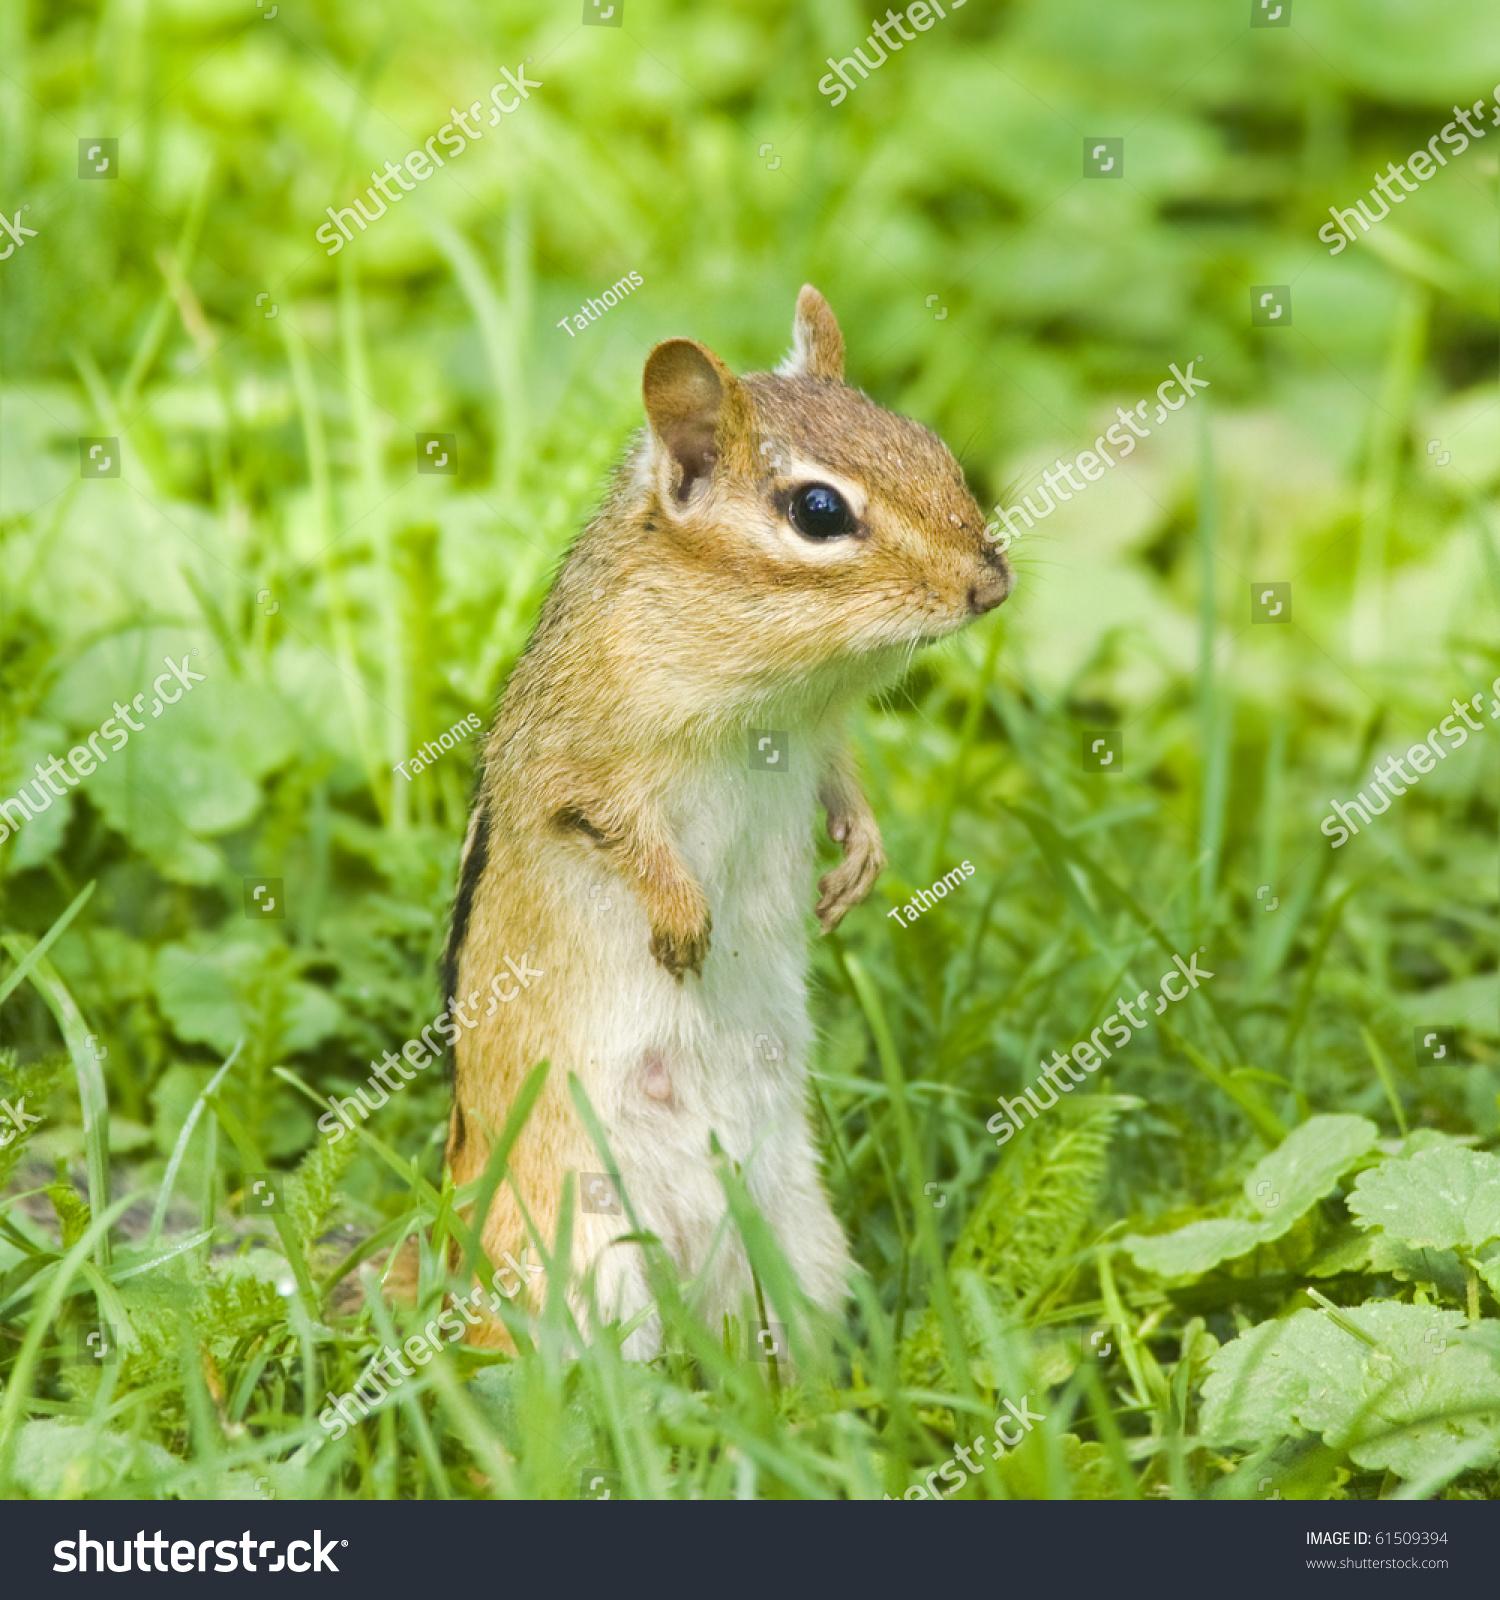 Chipmunk is bagging for food